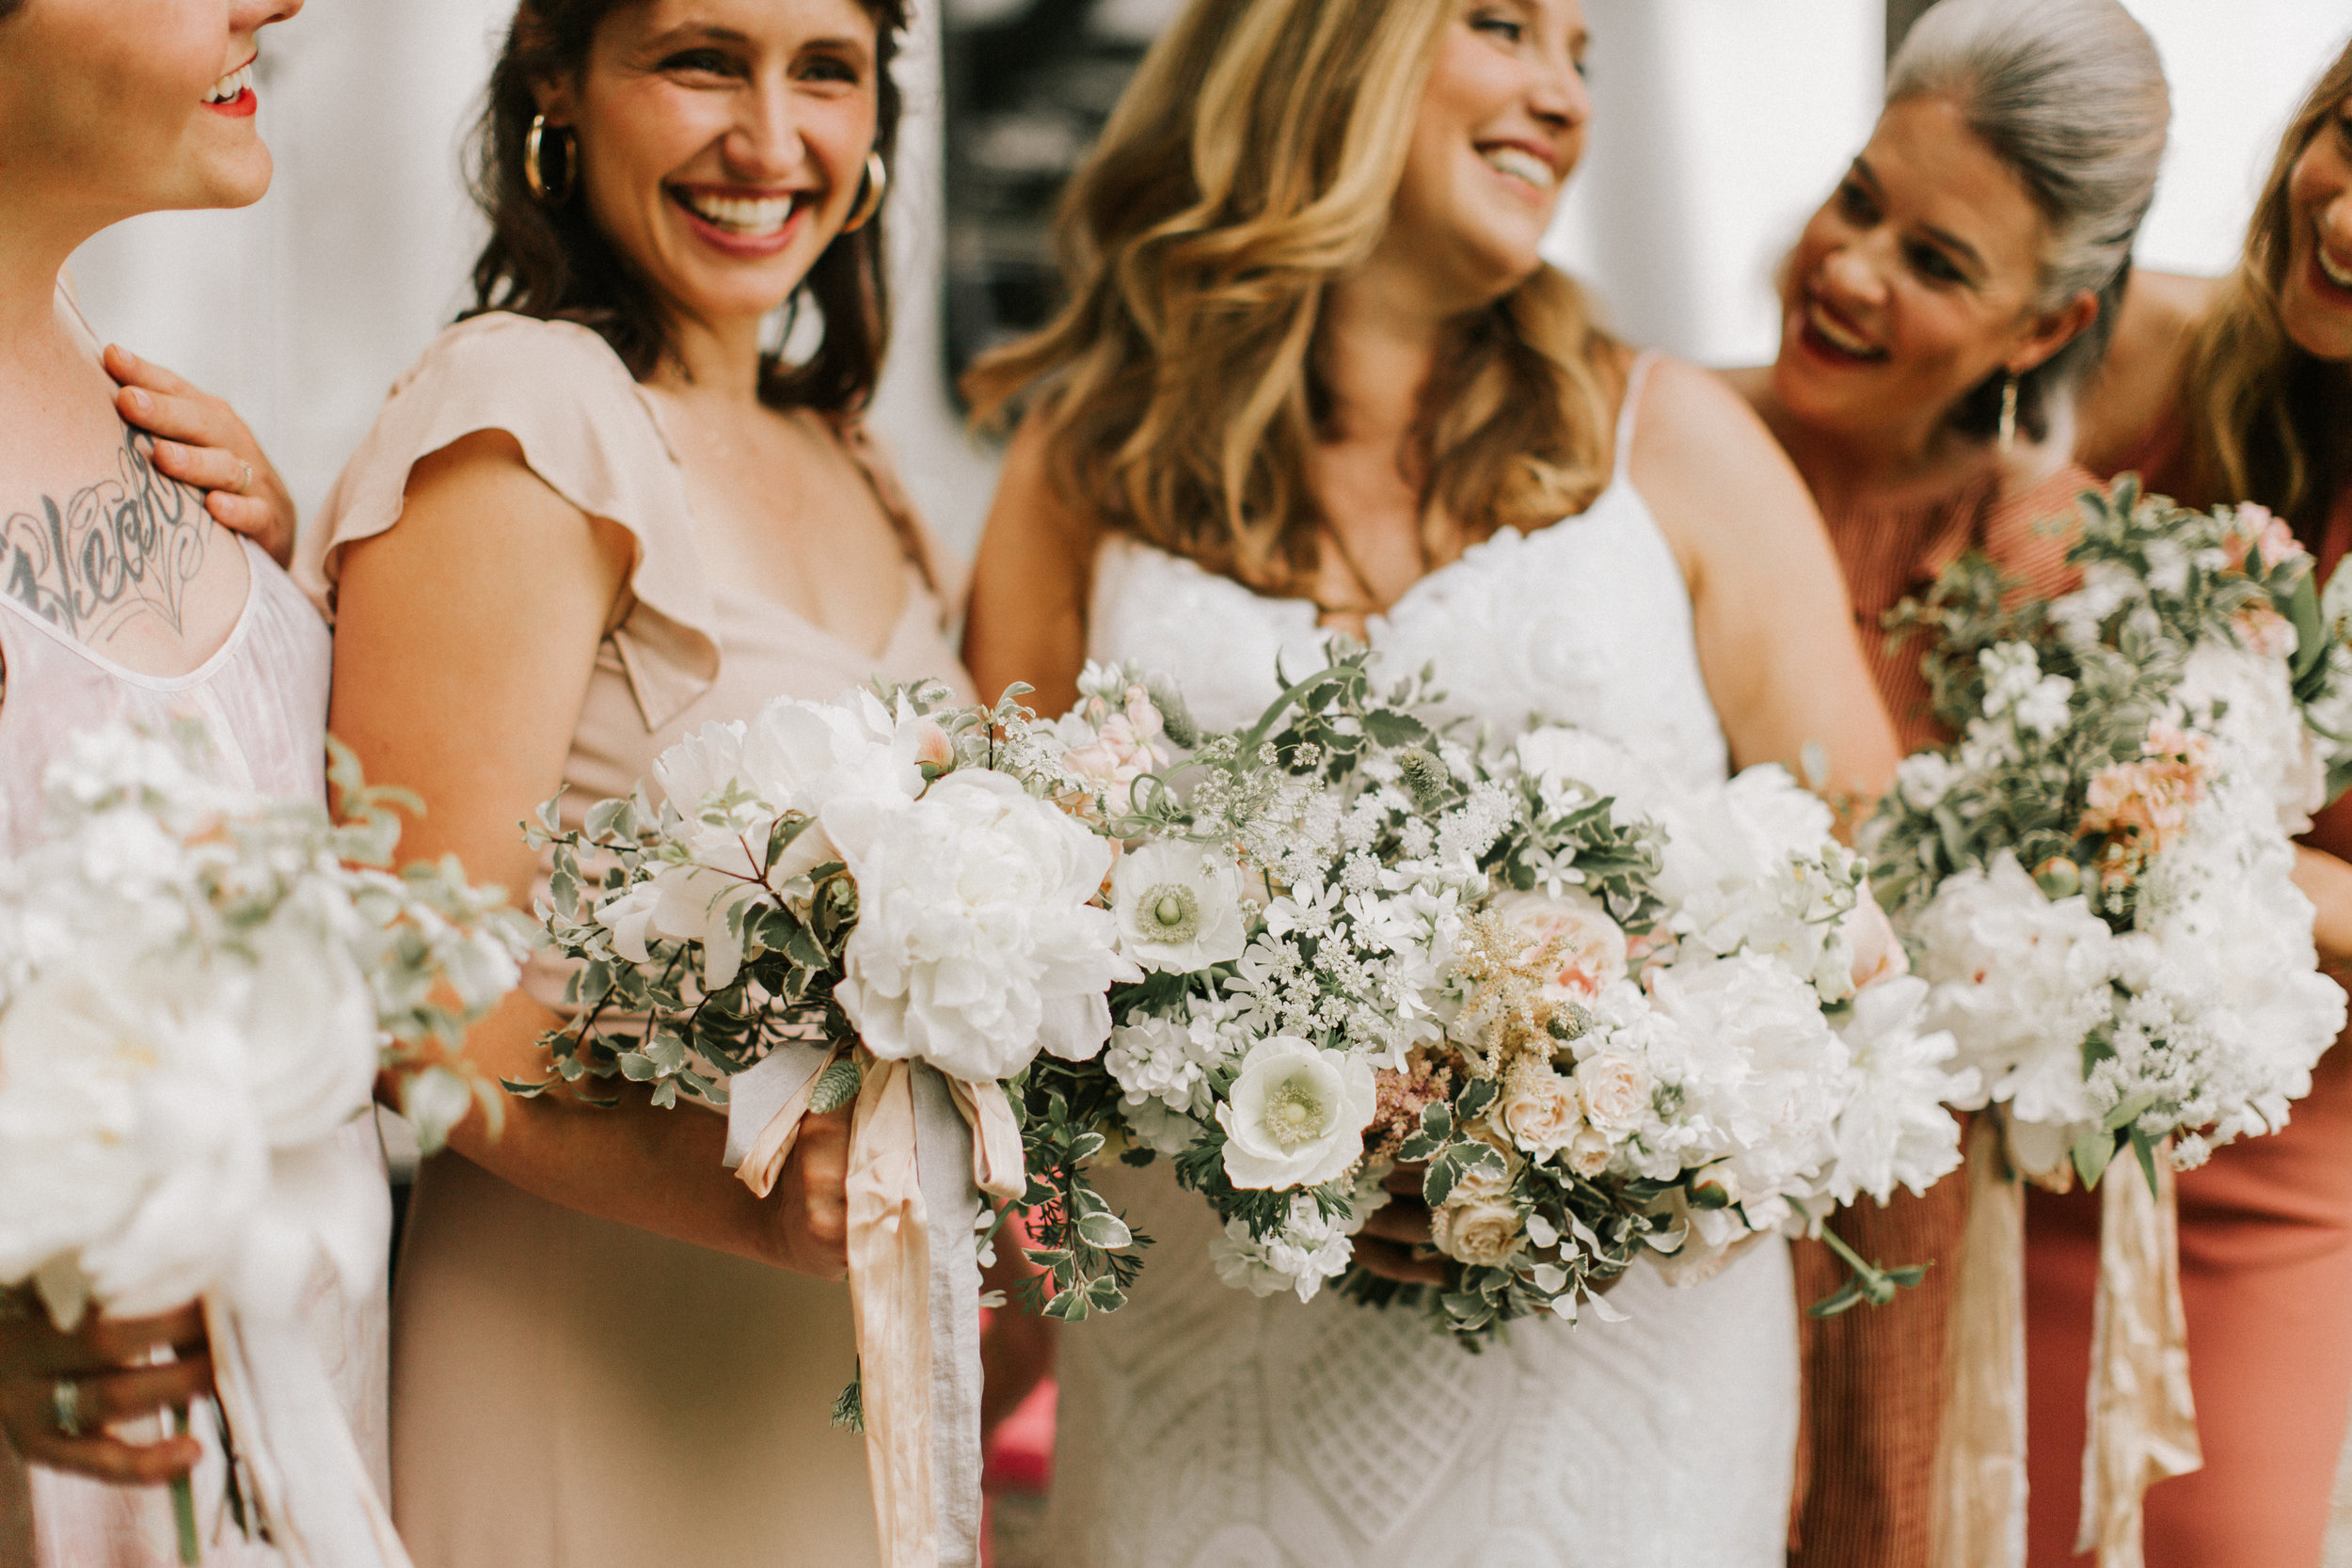 Watershed_Floral_Marianmade_Farm_Wedding_JamieMercurioPhoto2018-144.jpg